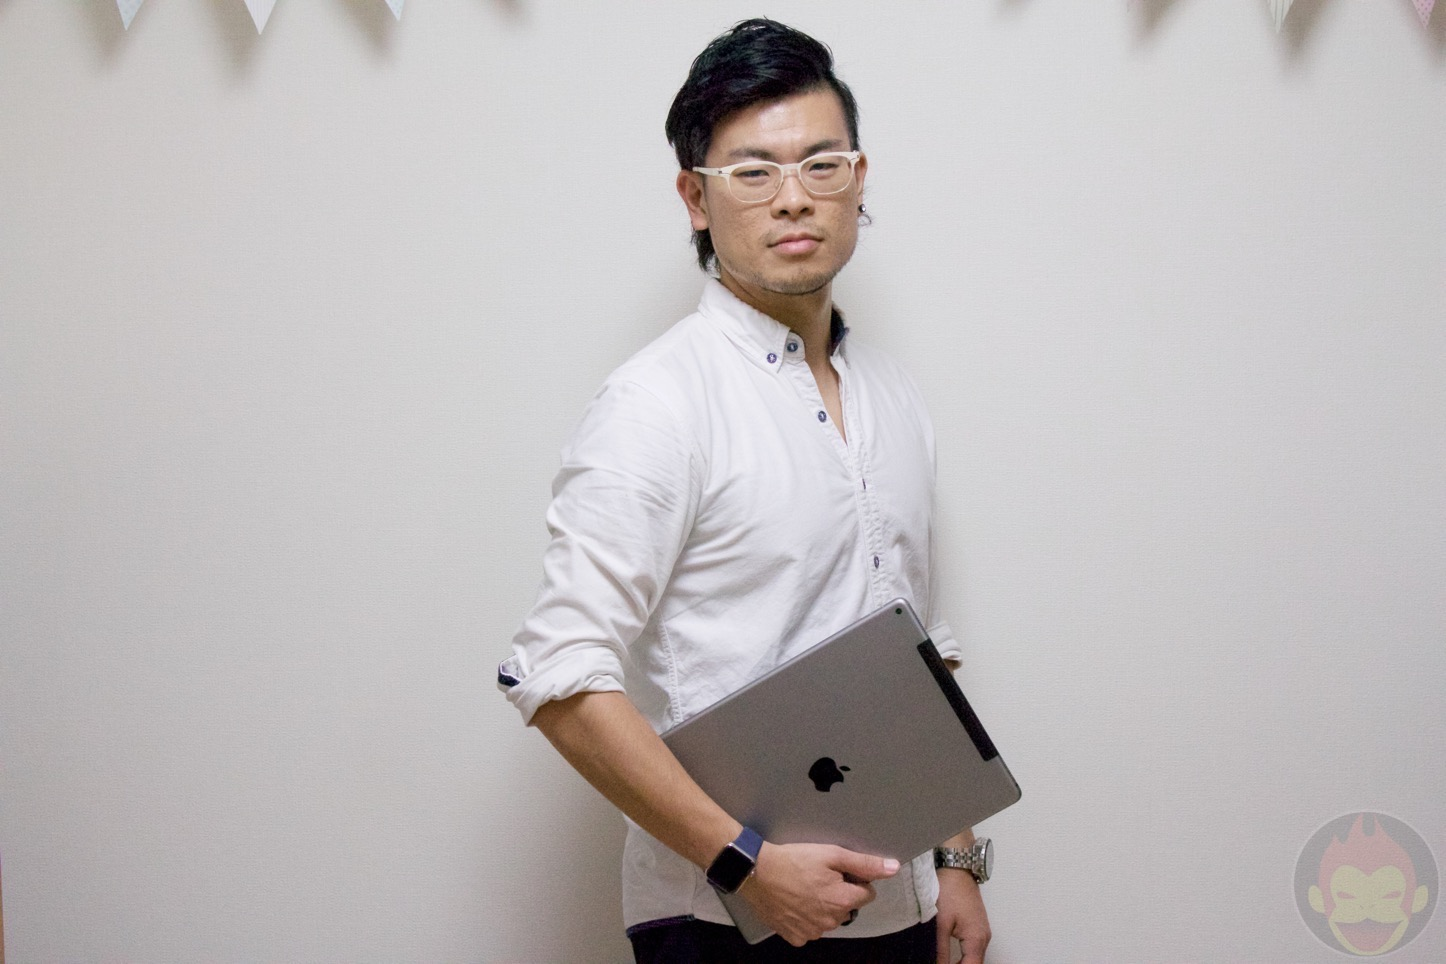 iPad-Pro-Air2-mini2-Comparison-008.jpg